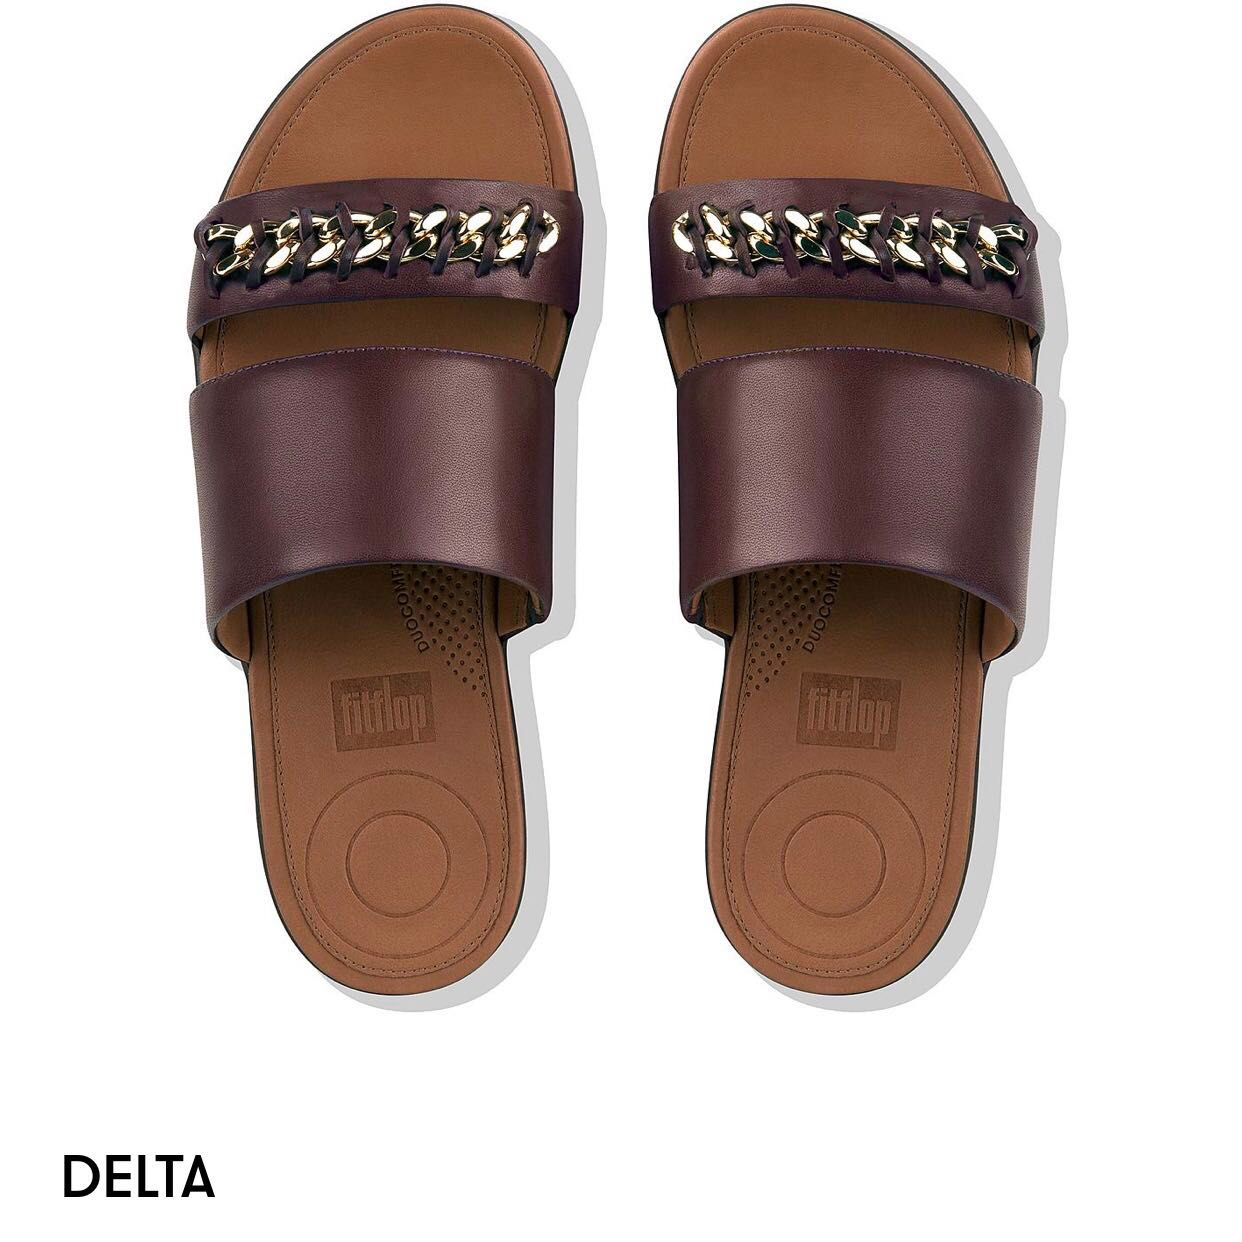 05a405fd8 SALE Fitflop Delta sandals